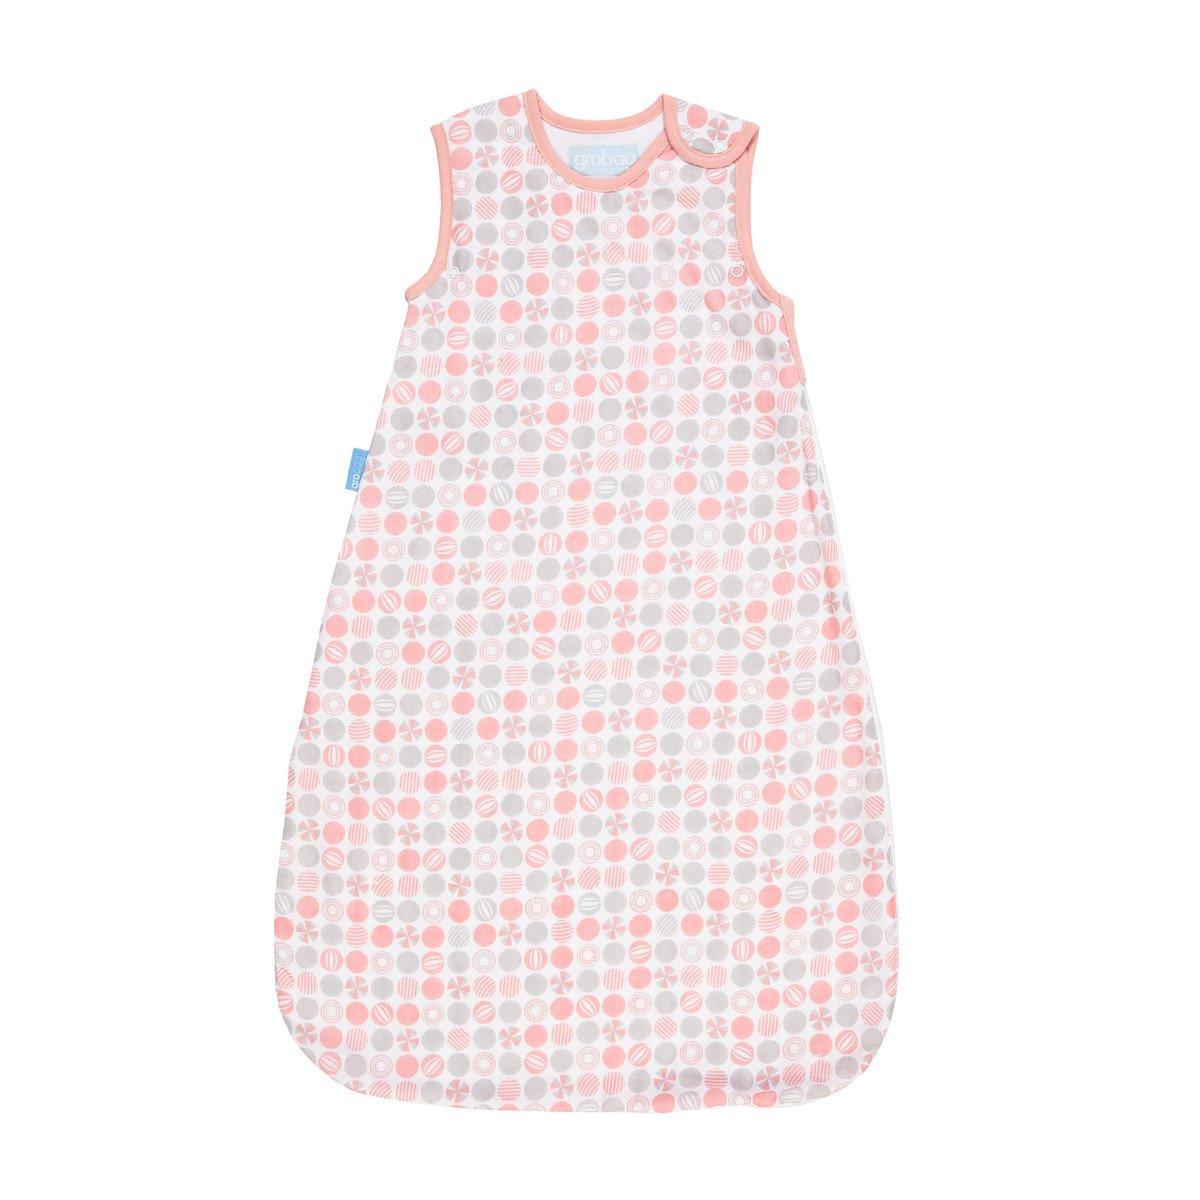 Grobag lightweave Sleeping Bag 18-36 months 1 Tog Pink GRPRB AAA5093